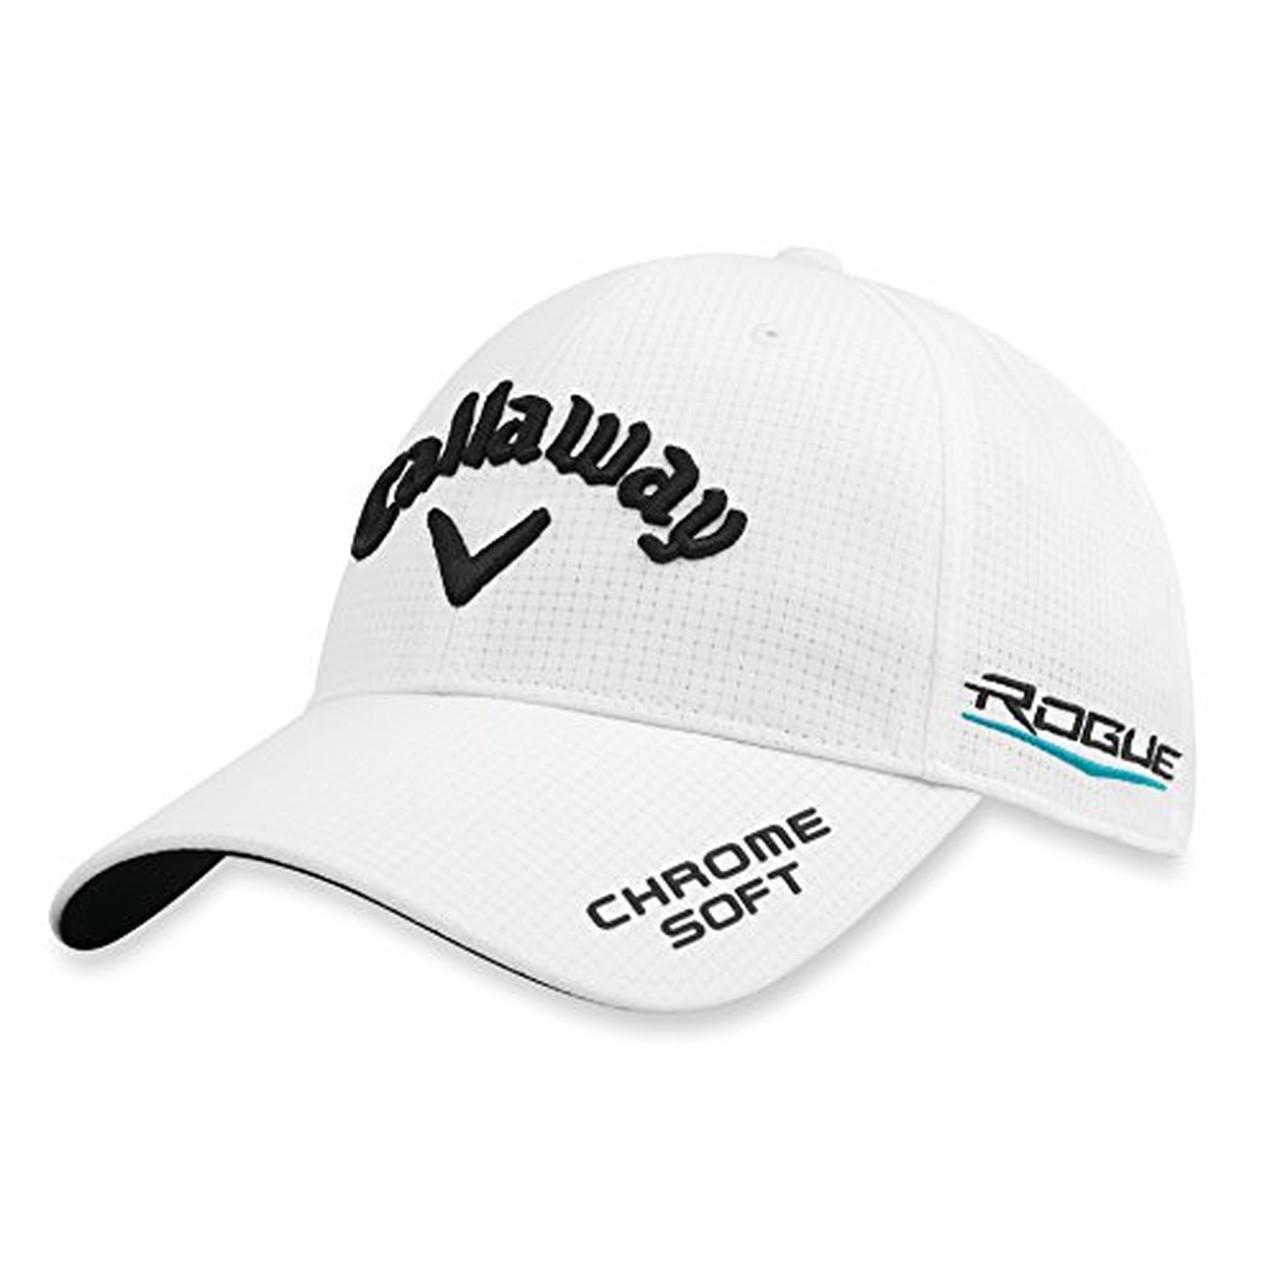 Callaway TA Performance Pro Rogue Cap - Navy - White